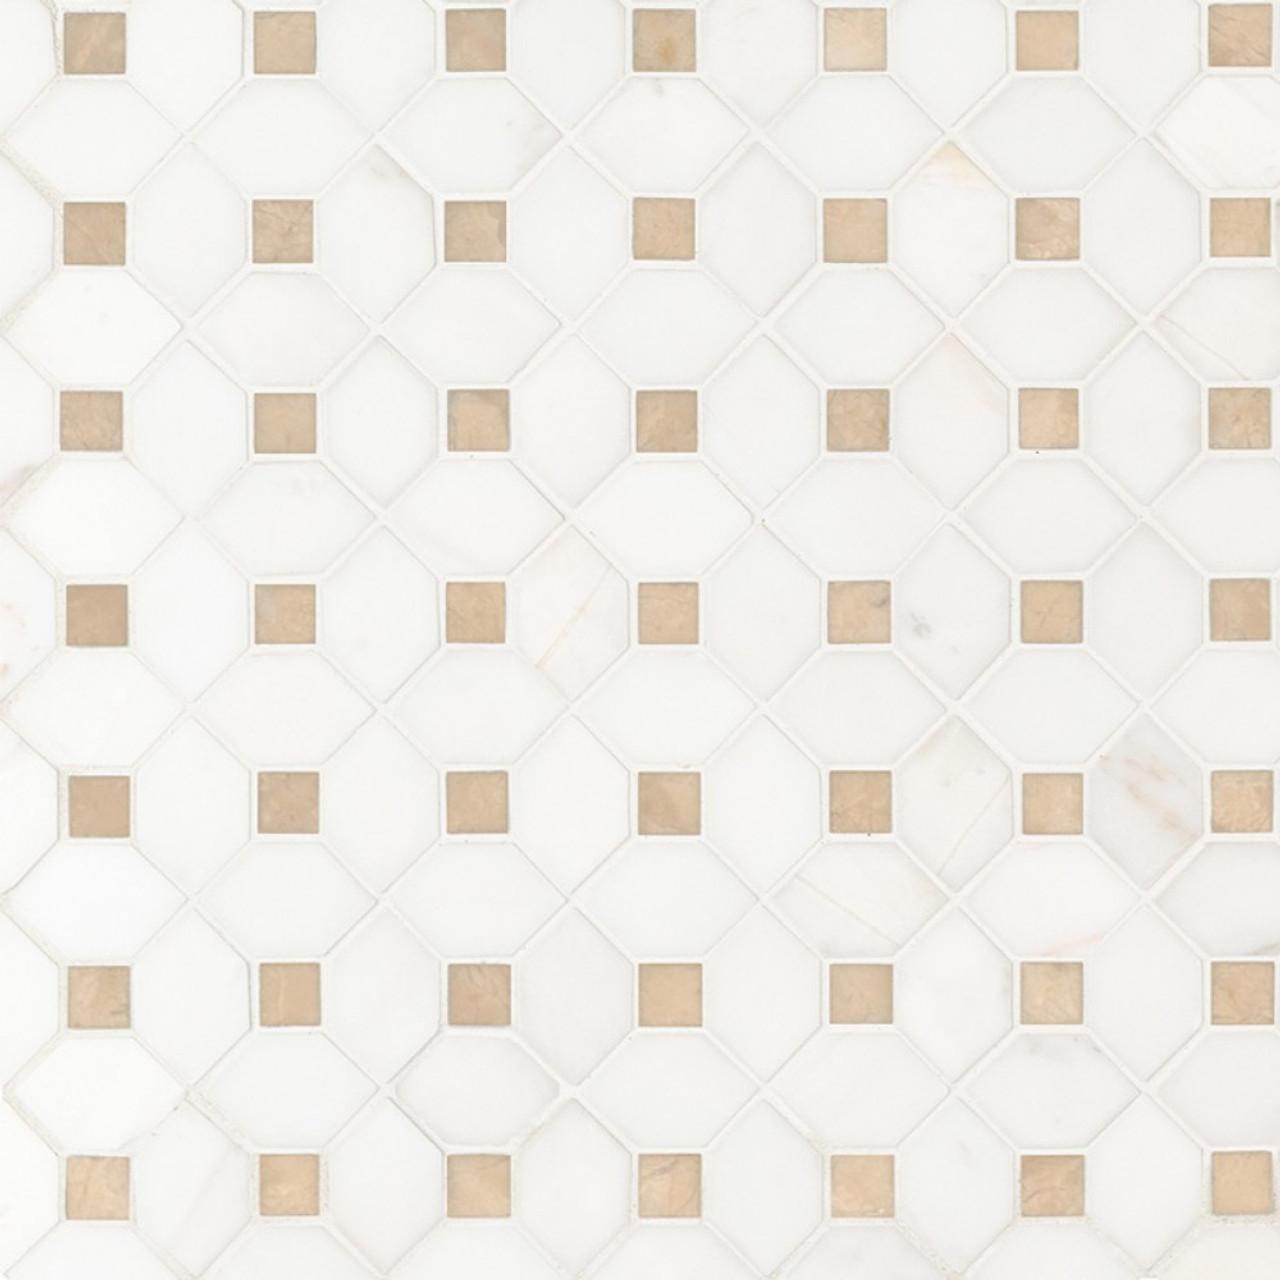 ms international specialty shapes wall series bianco dolomite crema dotty polished backsplash mosaic tile smot biandol cemdotp